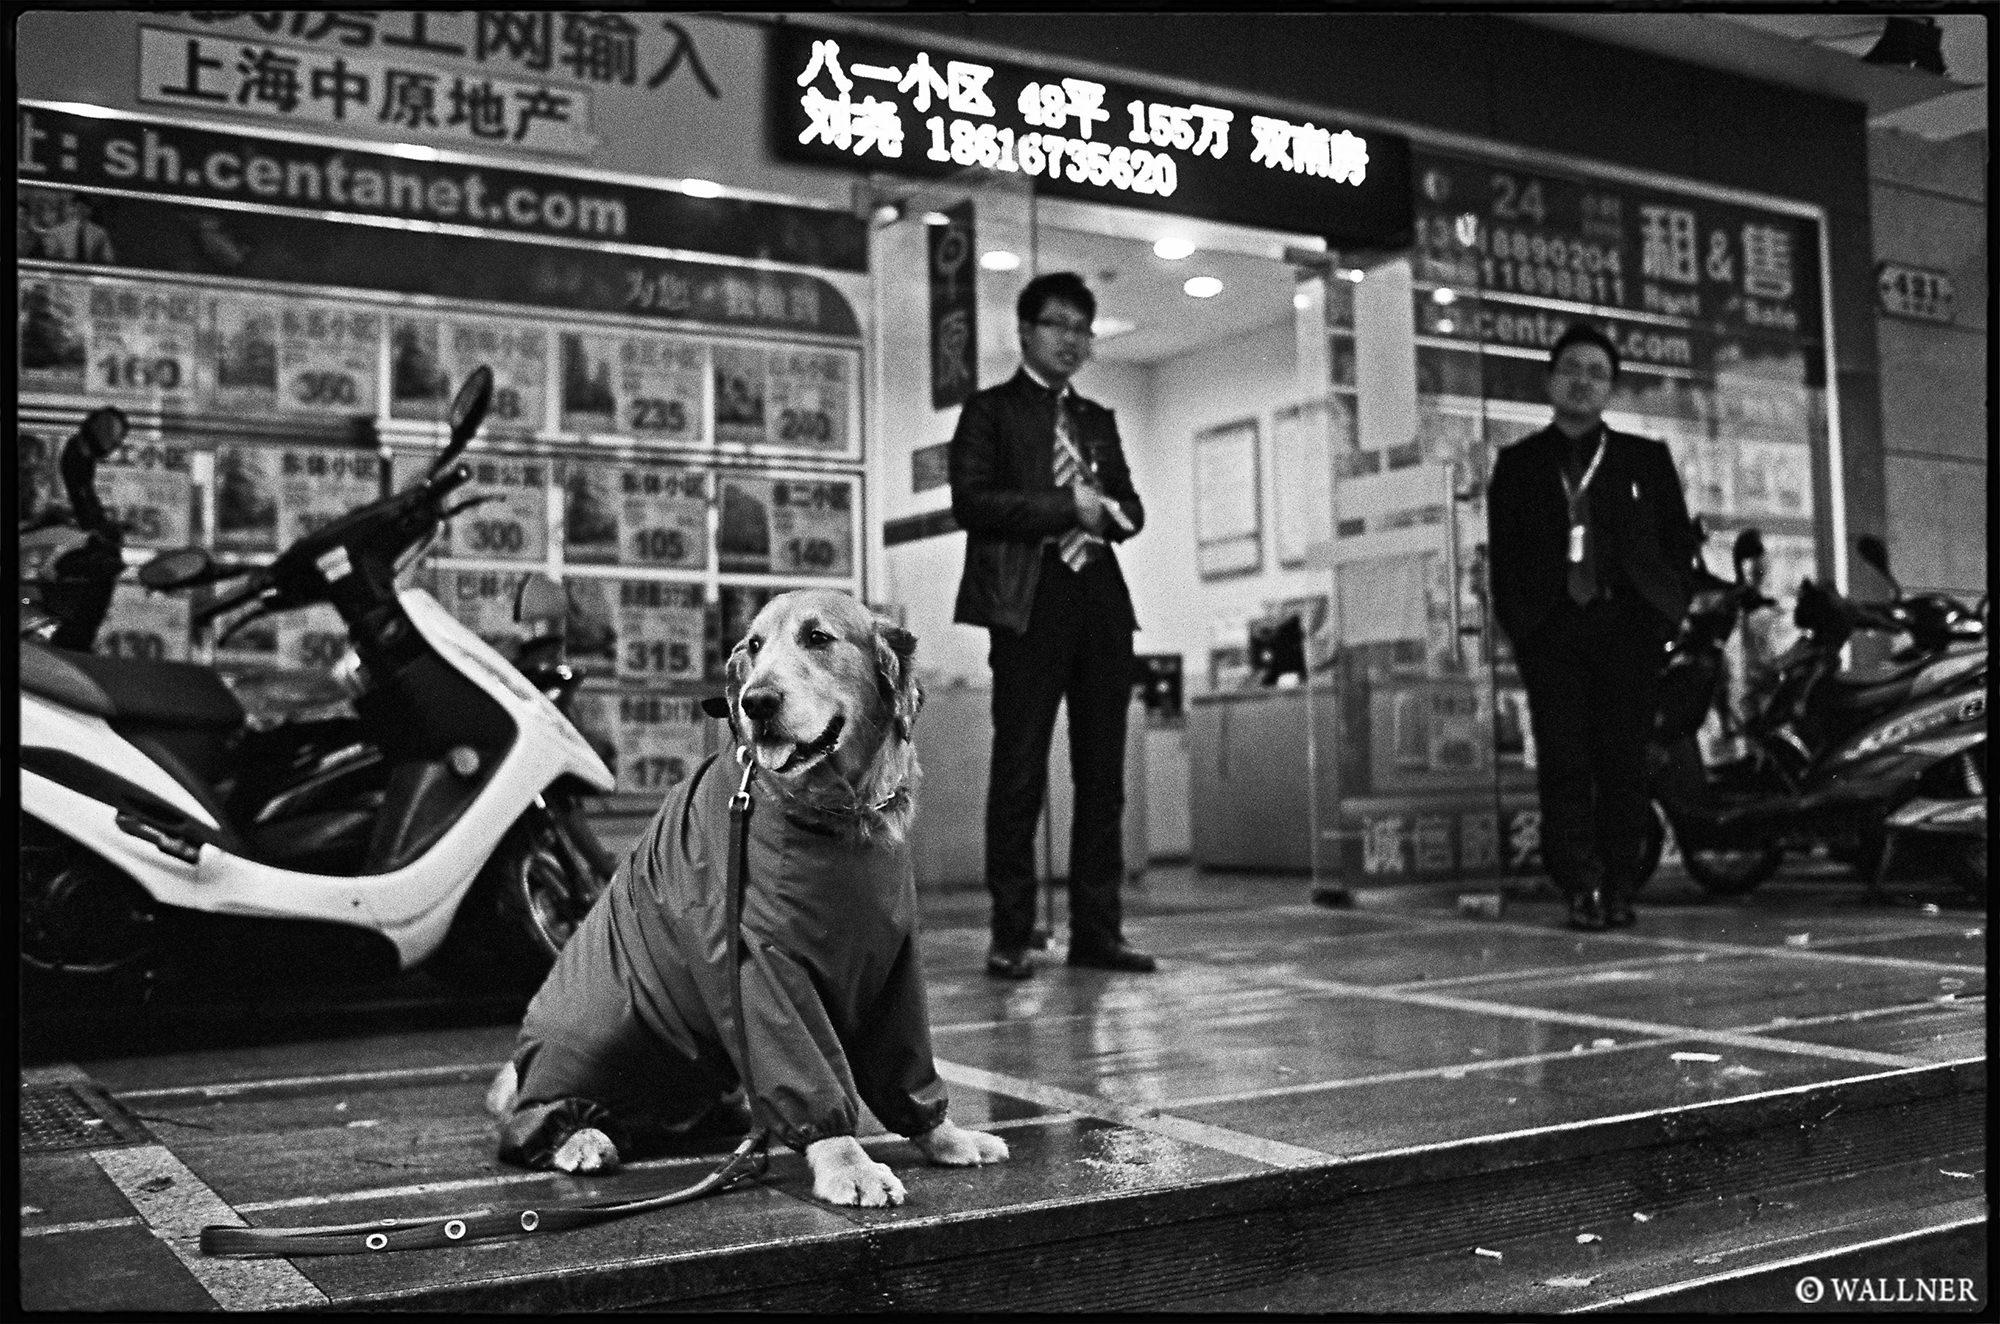 35mmPatrikWallner_Shanghai_DoggyCoat LOWQ 2000P